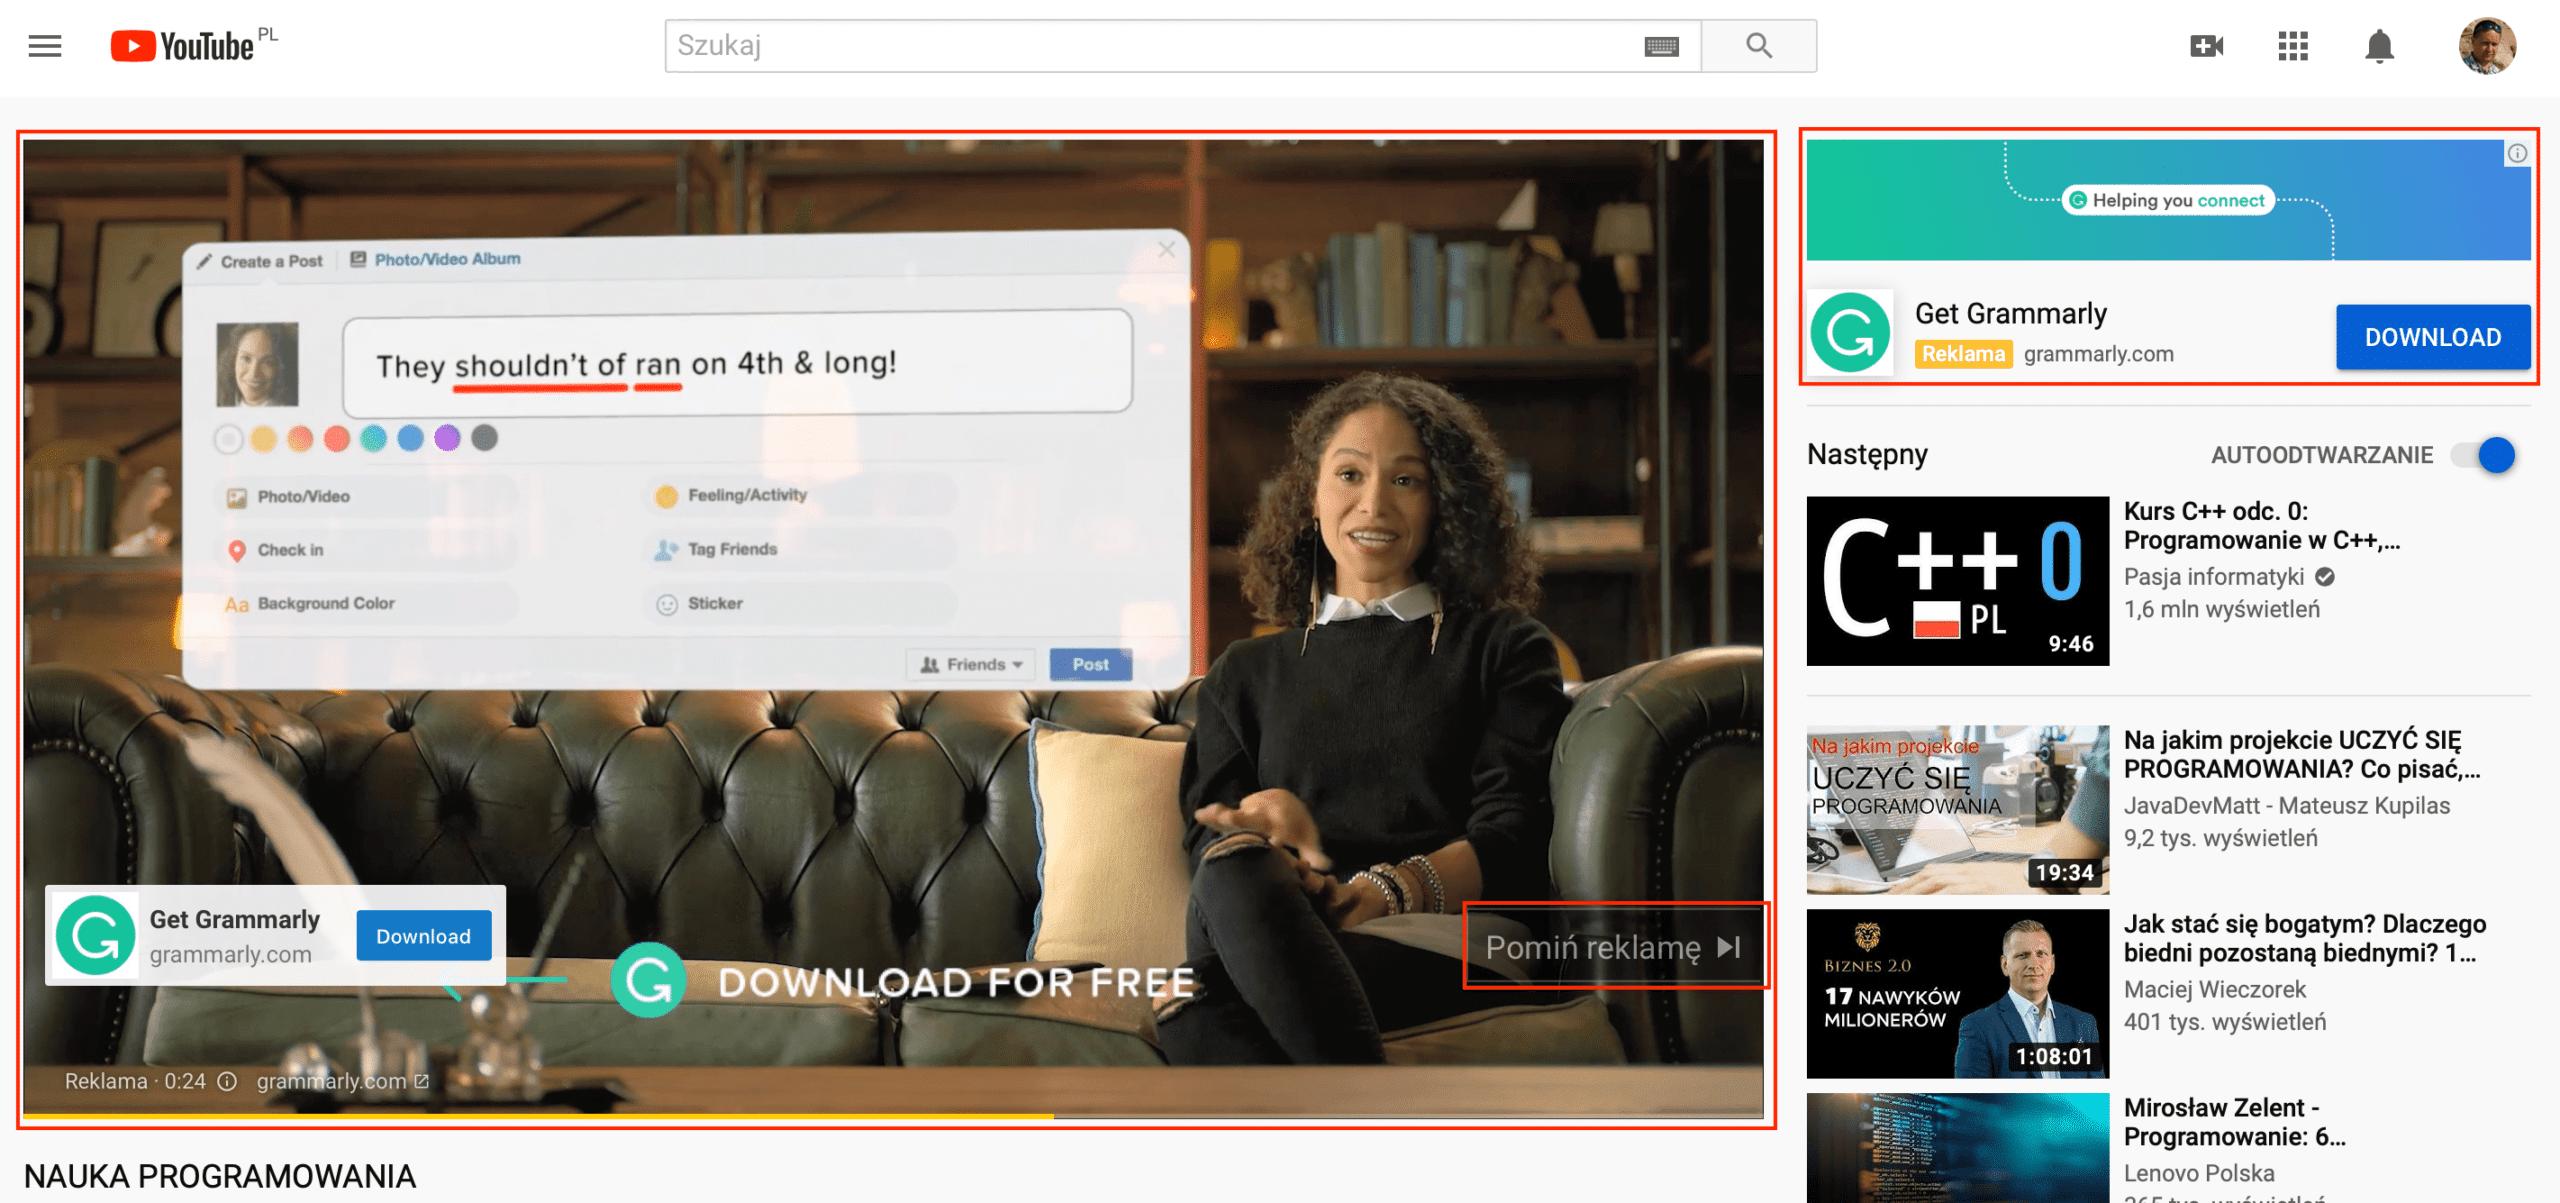 Reklama YouTube In-Stream Video